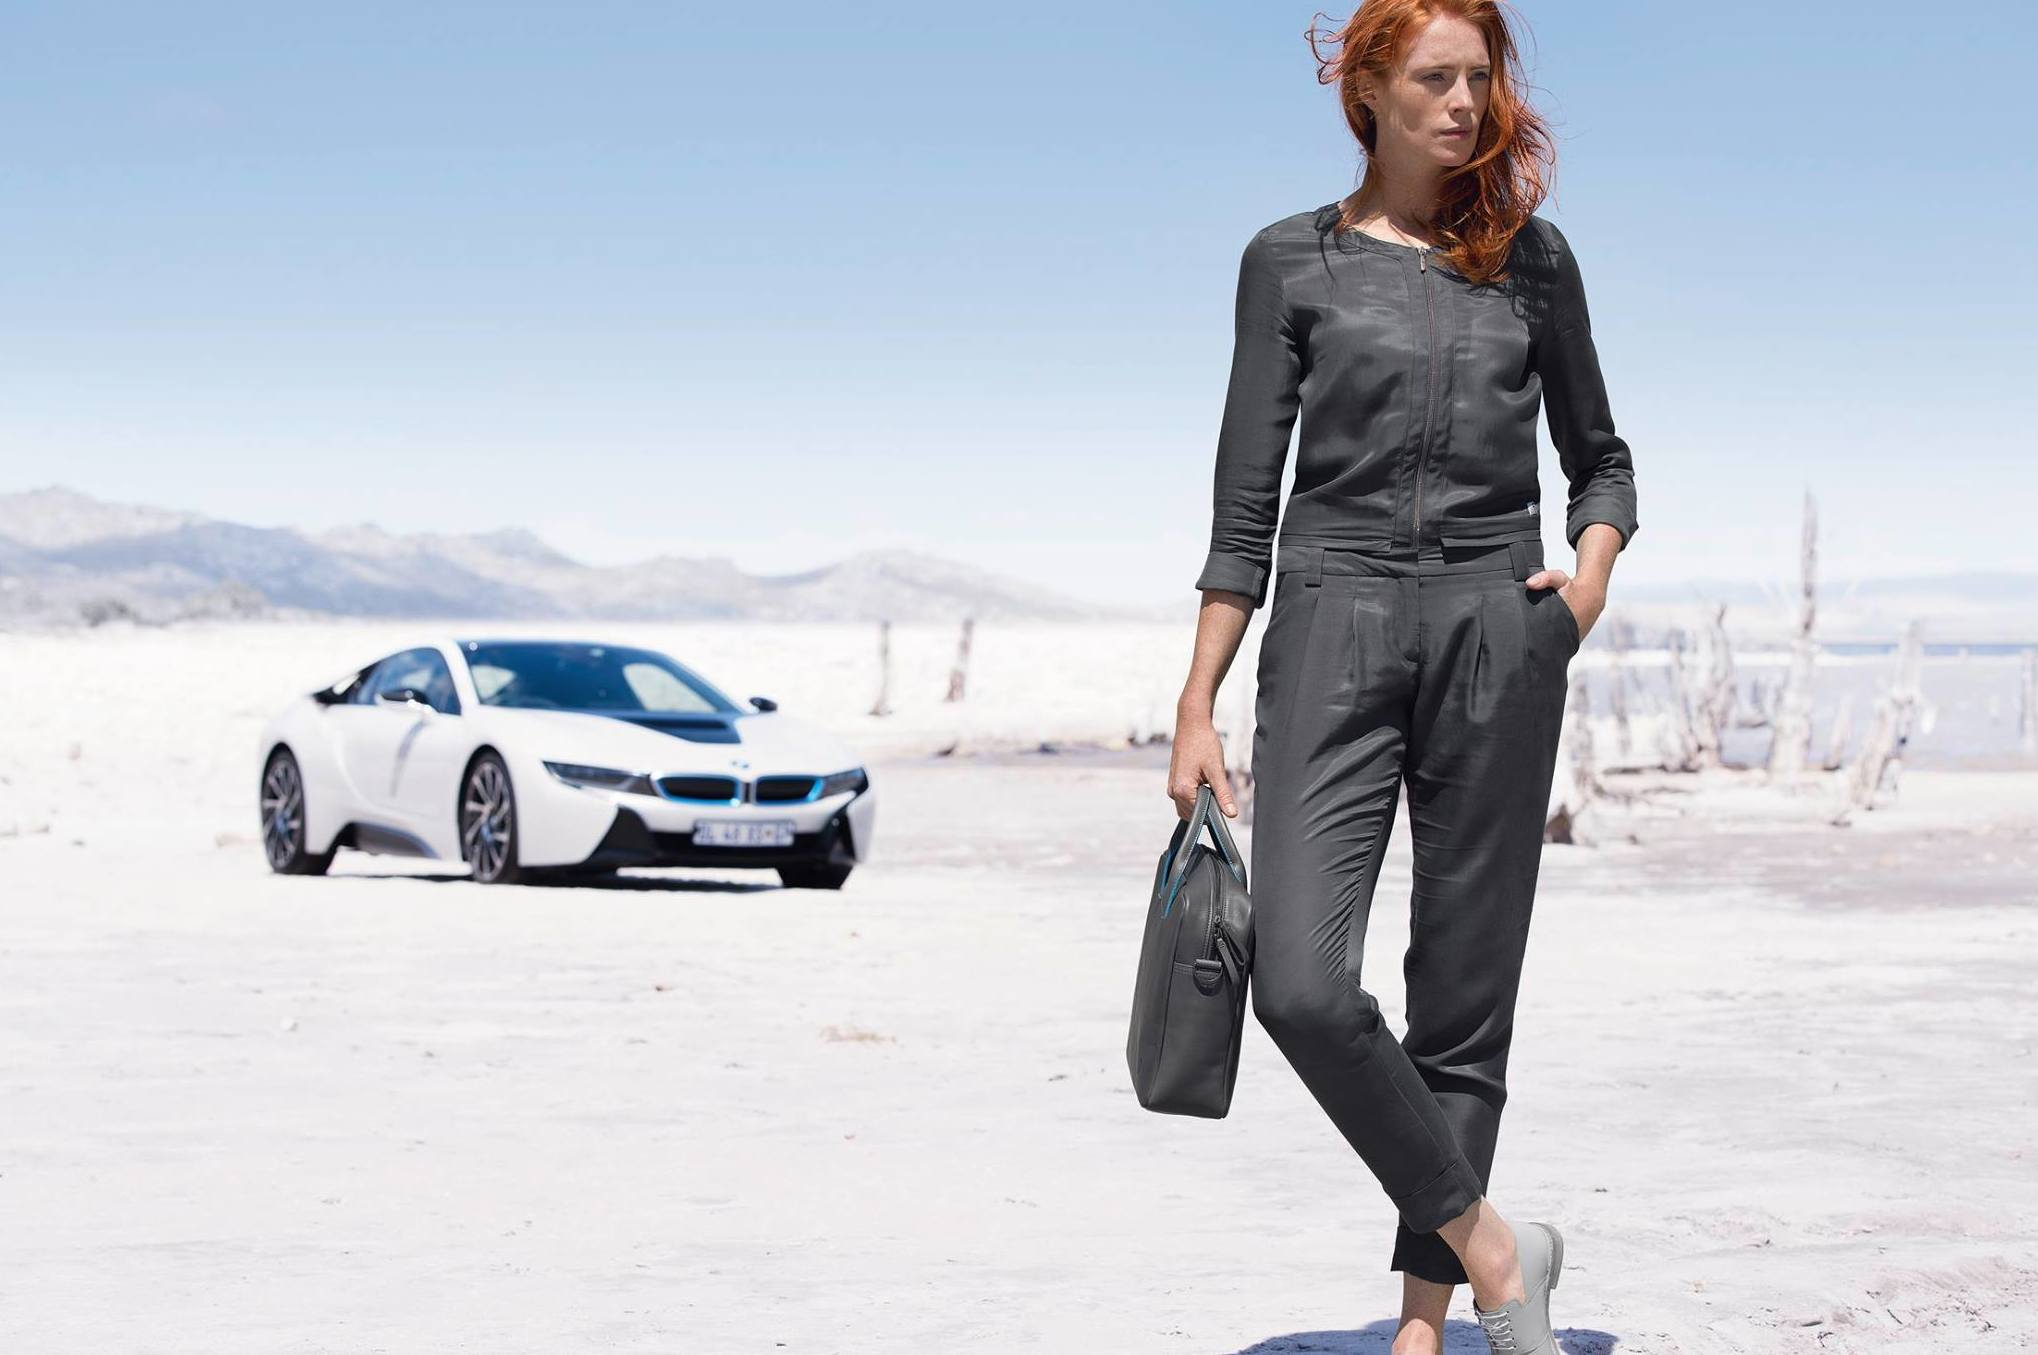 BMW LIFESTYLE 15 / 17: Catálogo de Spamóvil Servicio Oficial BMW-MINI